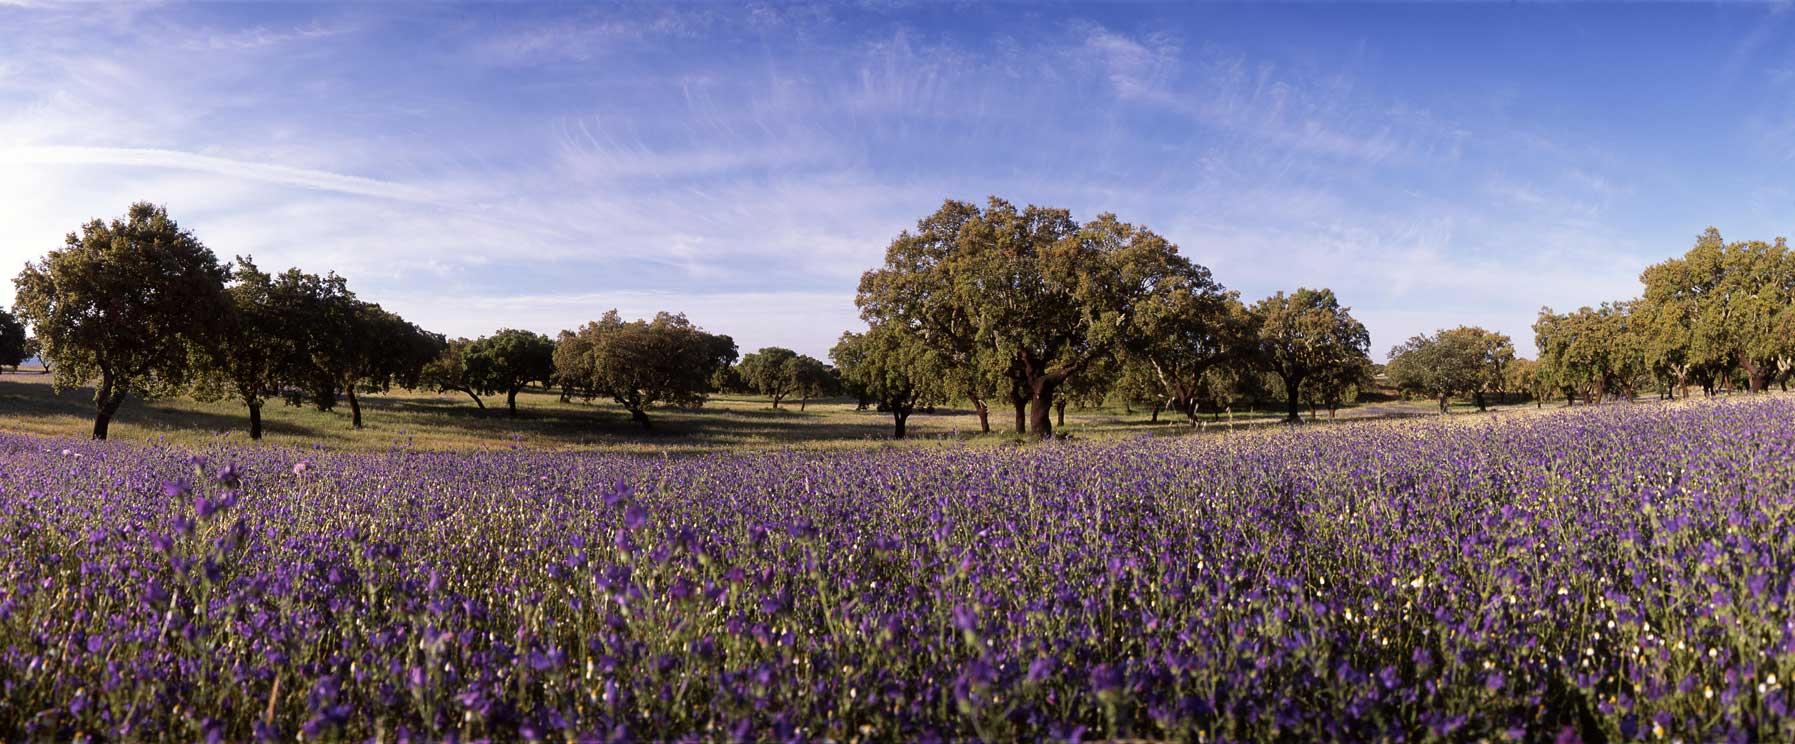 A cork oak forest in Portugal is rich in bio-diversity. Picture: Apcor